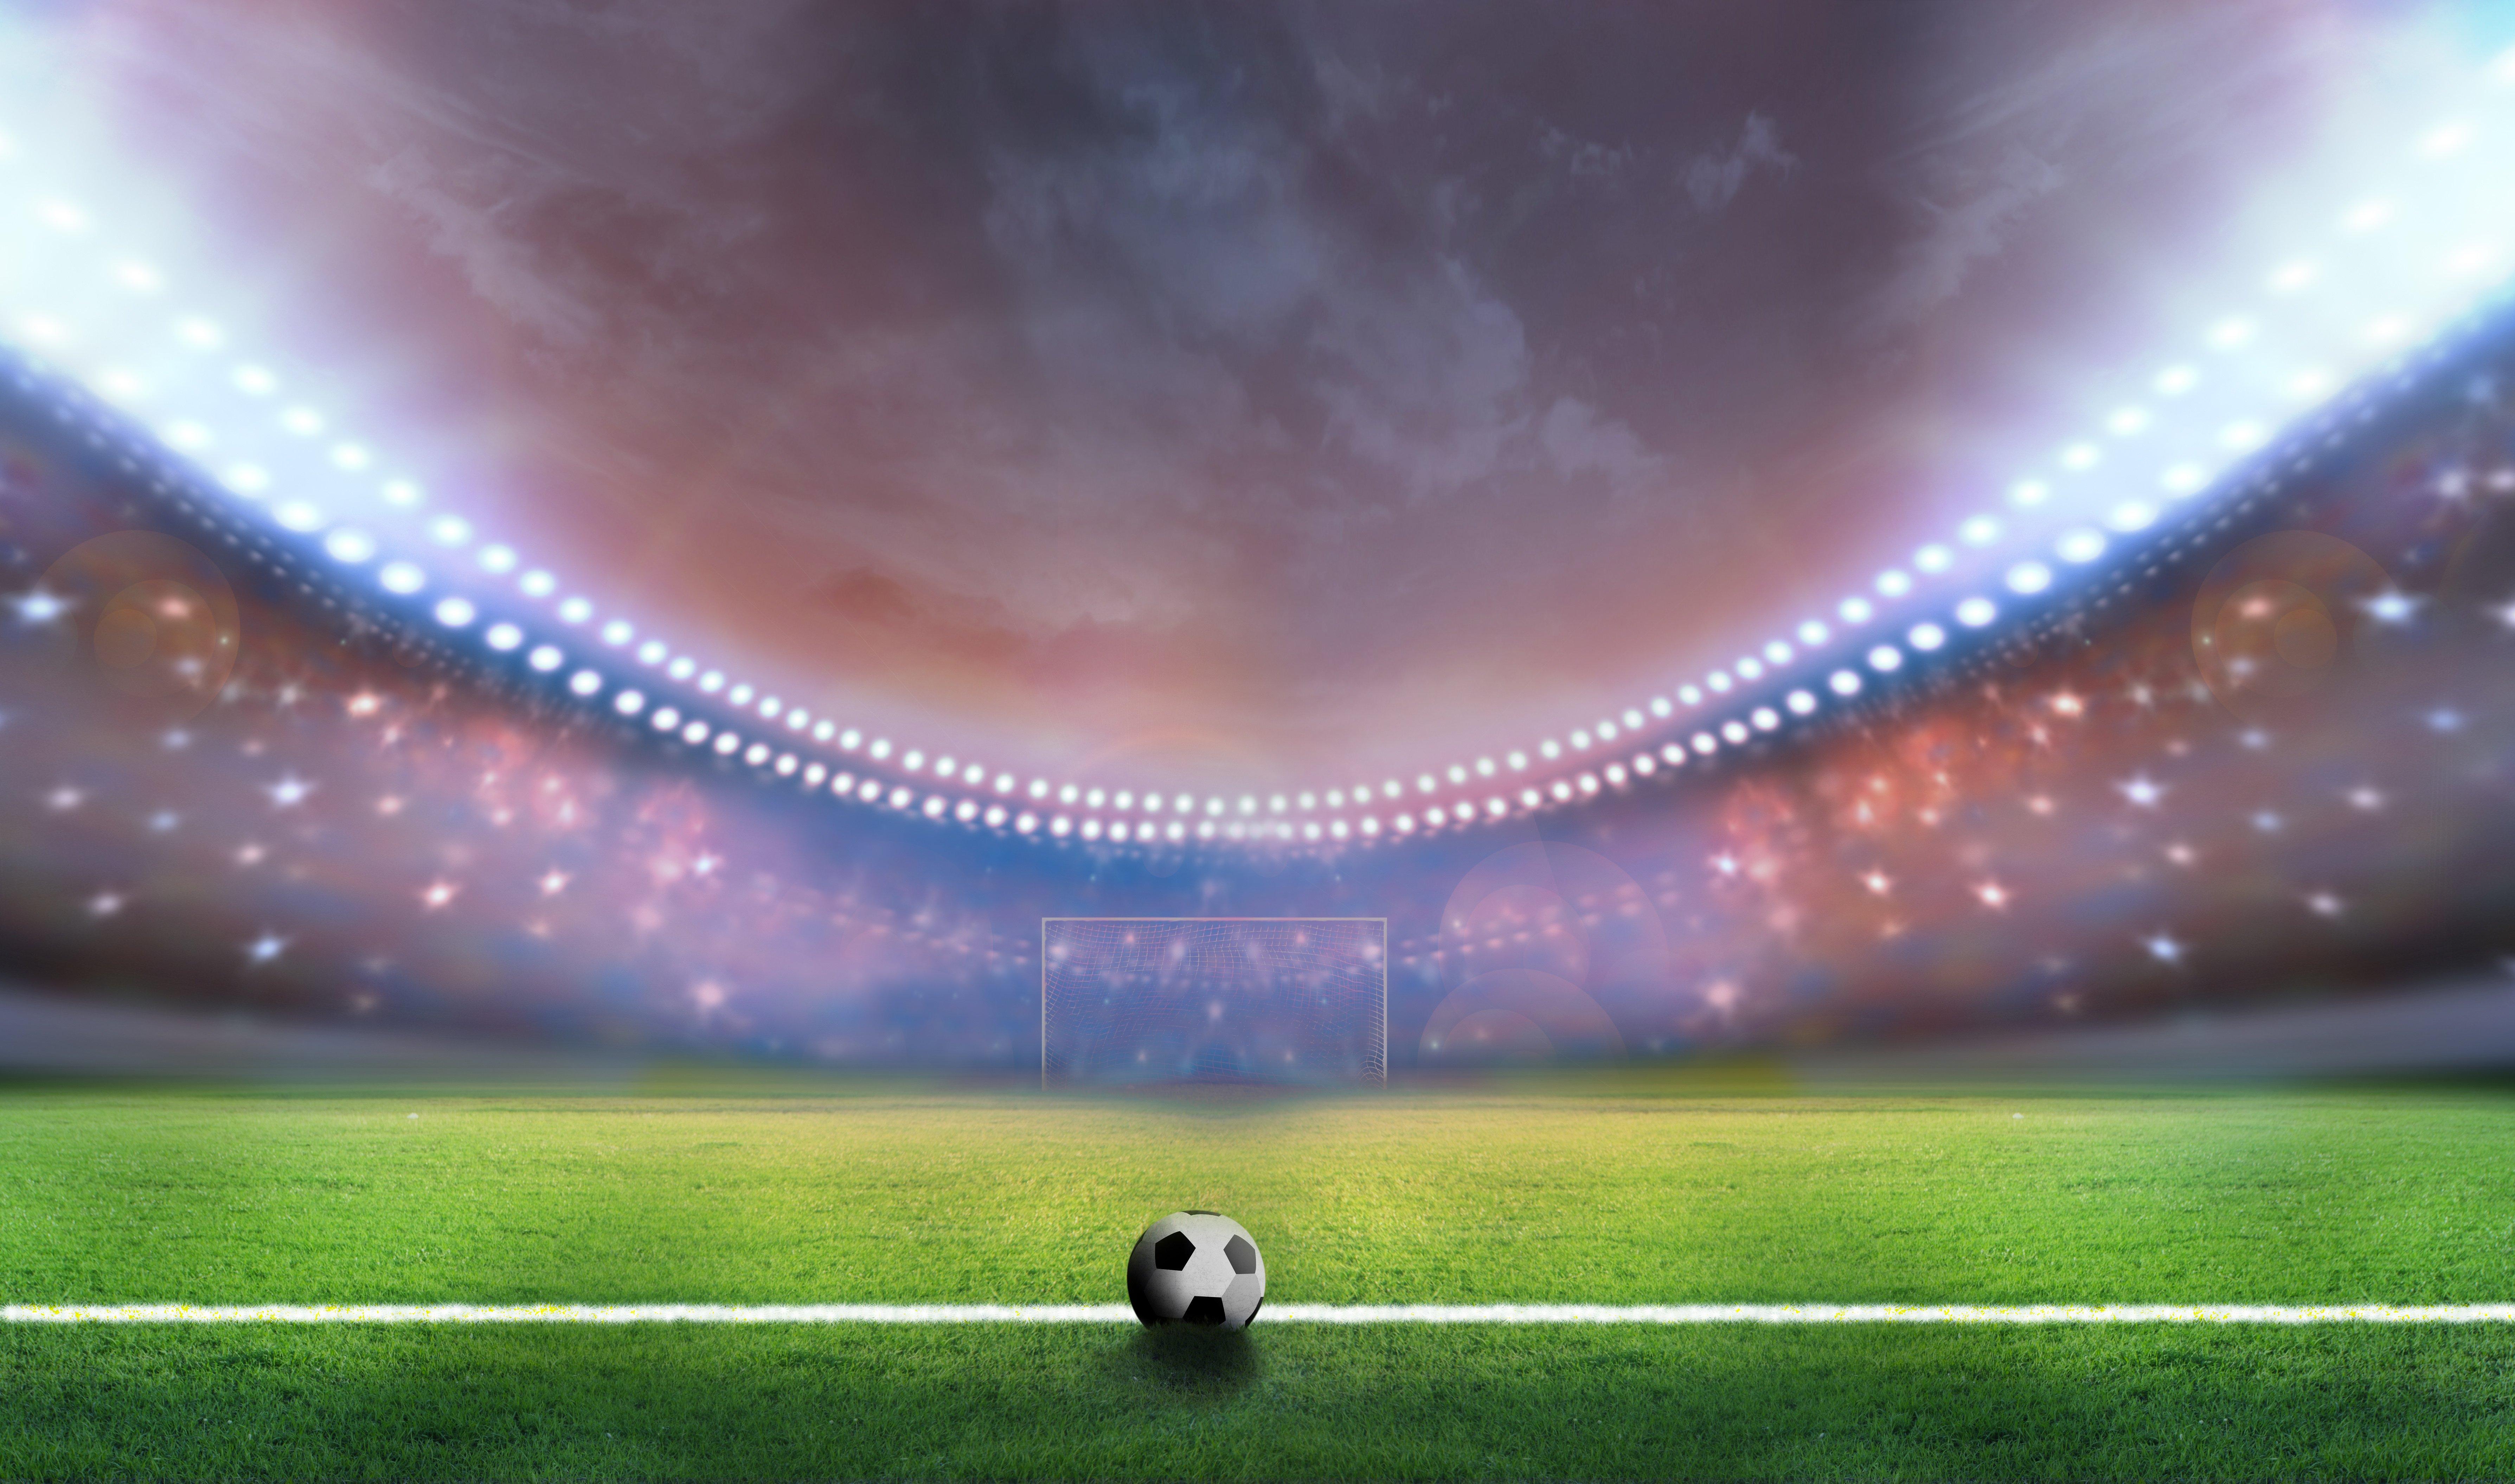 Beautiful-Soccer-Football-AllNeed-wallpaper-wpc9002727